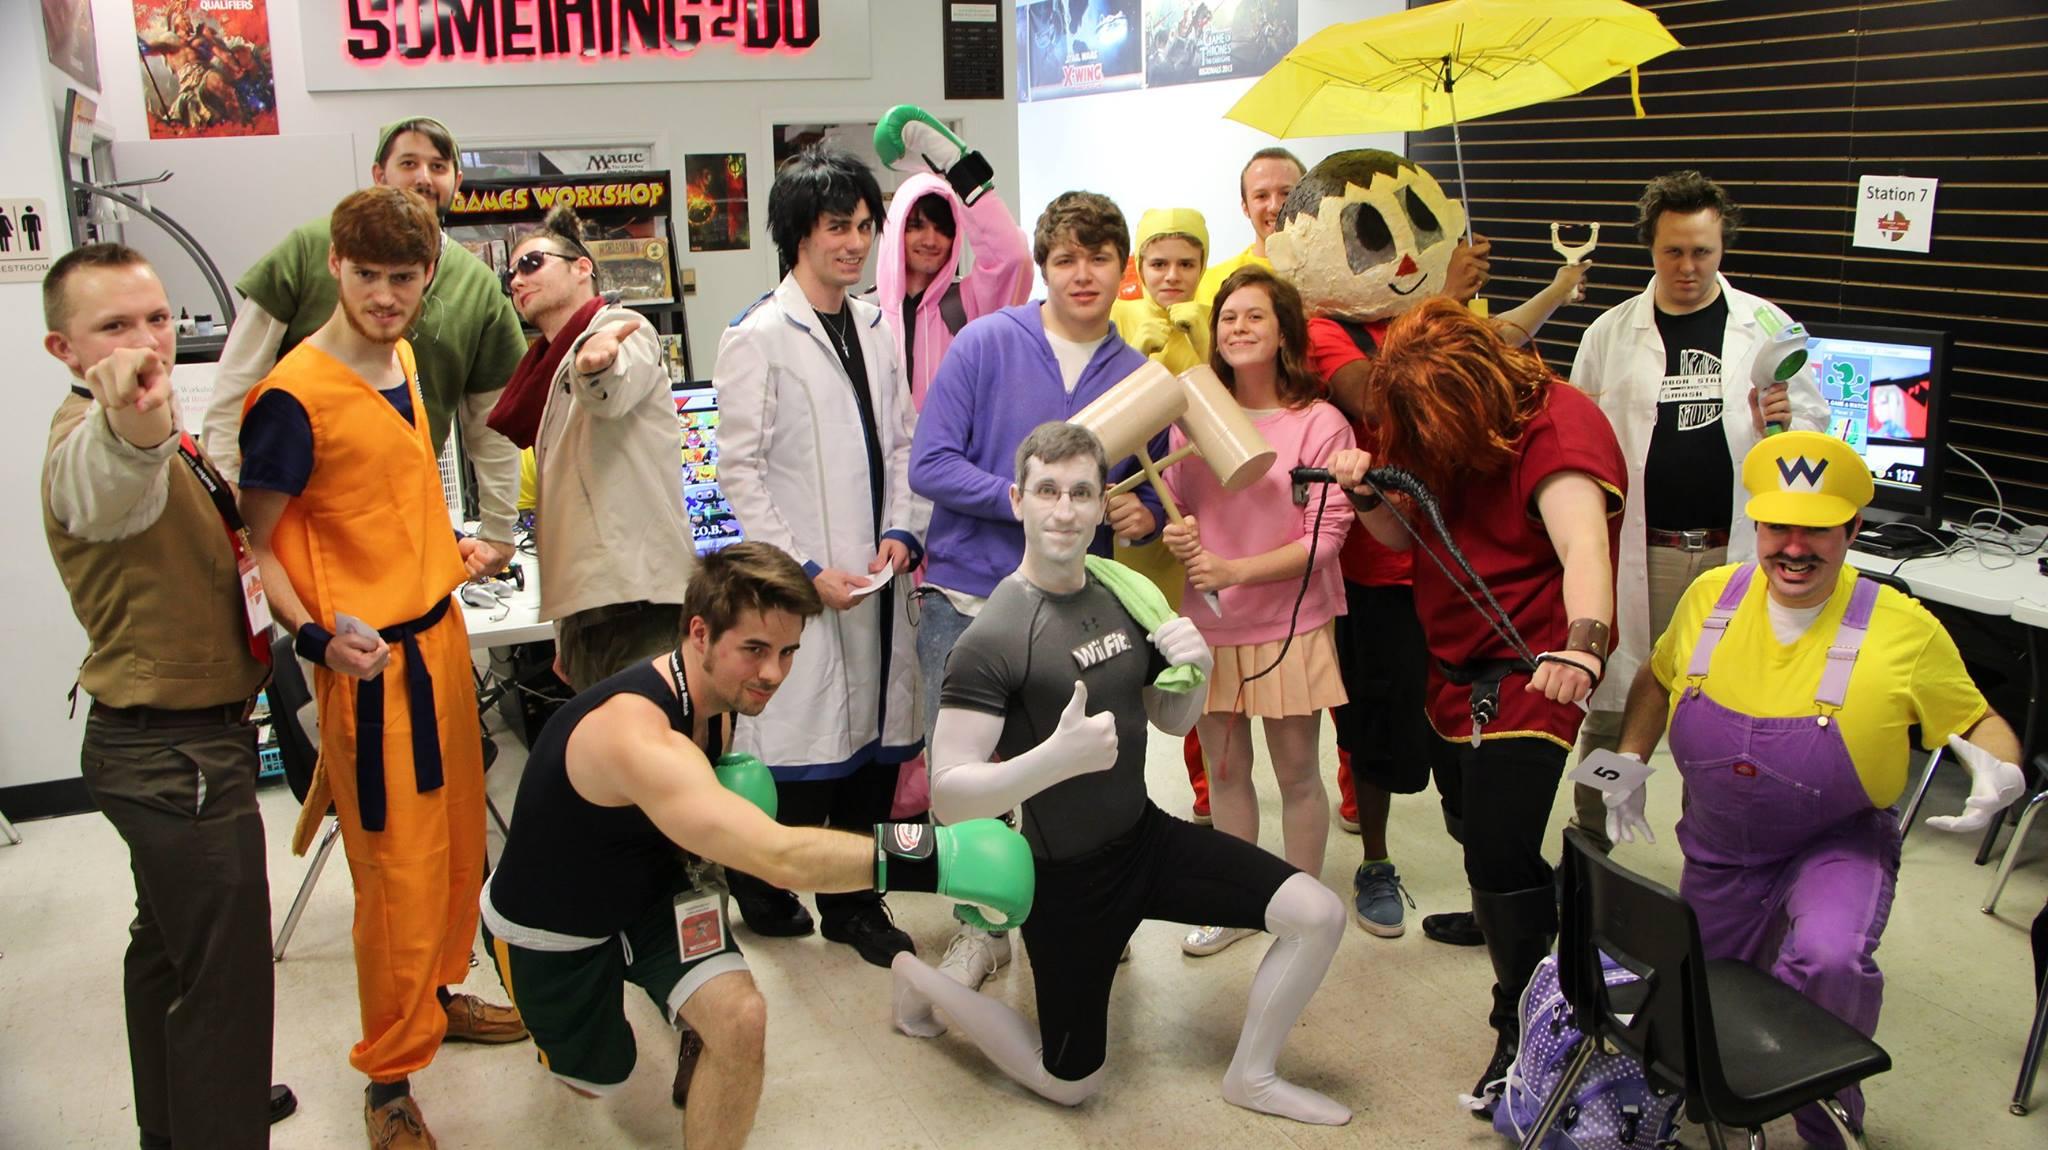 bourbon-state-smash-nerd-louisville-costume-contest